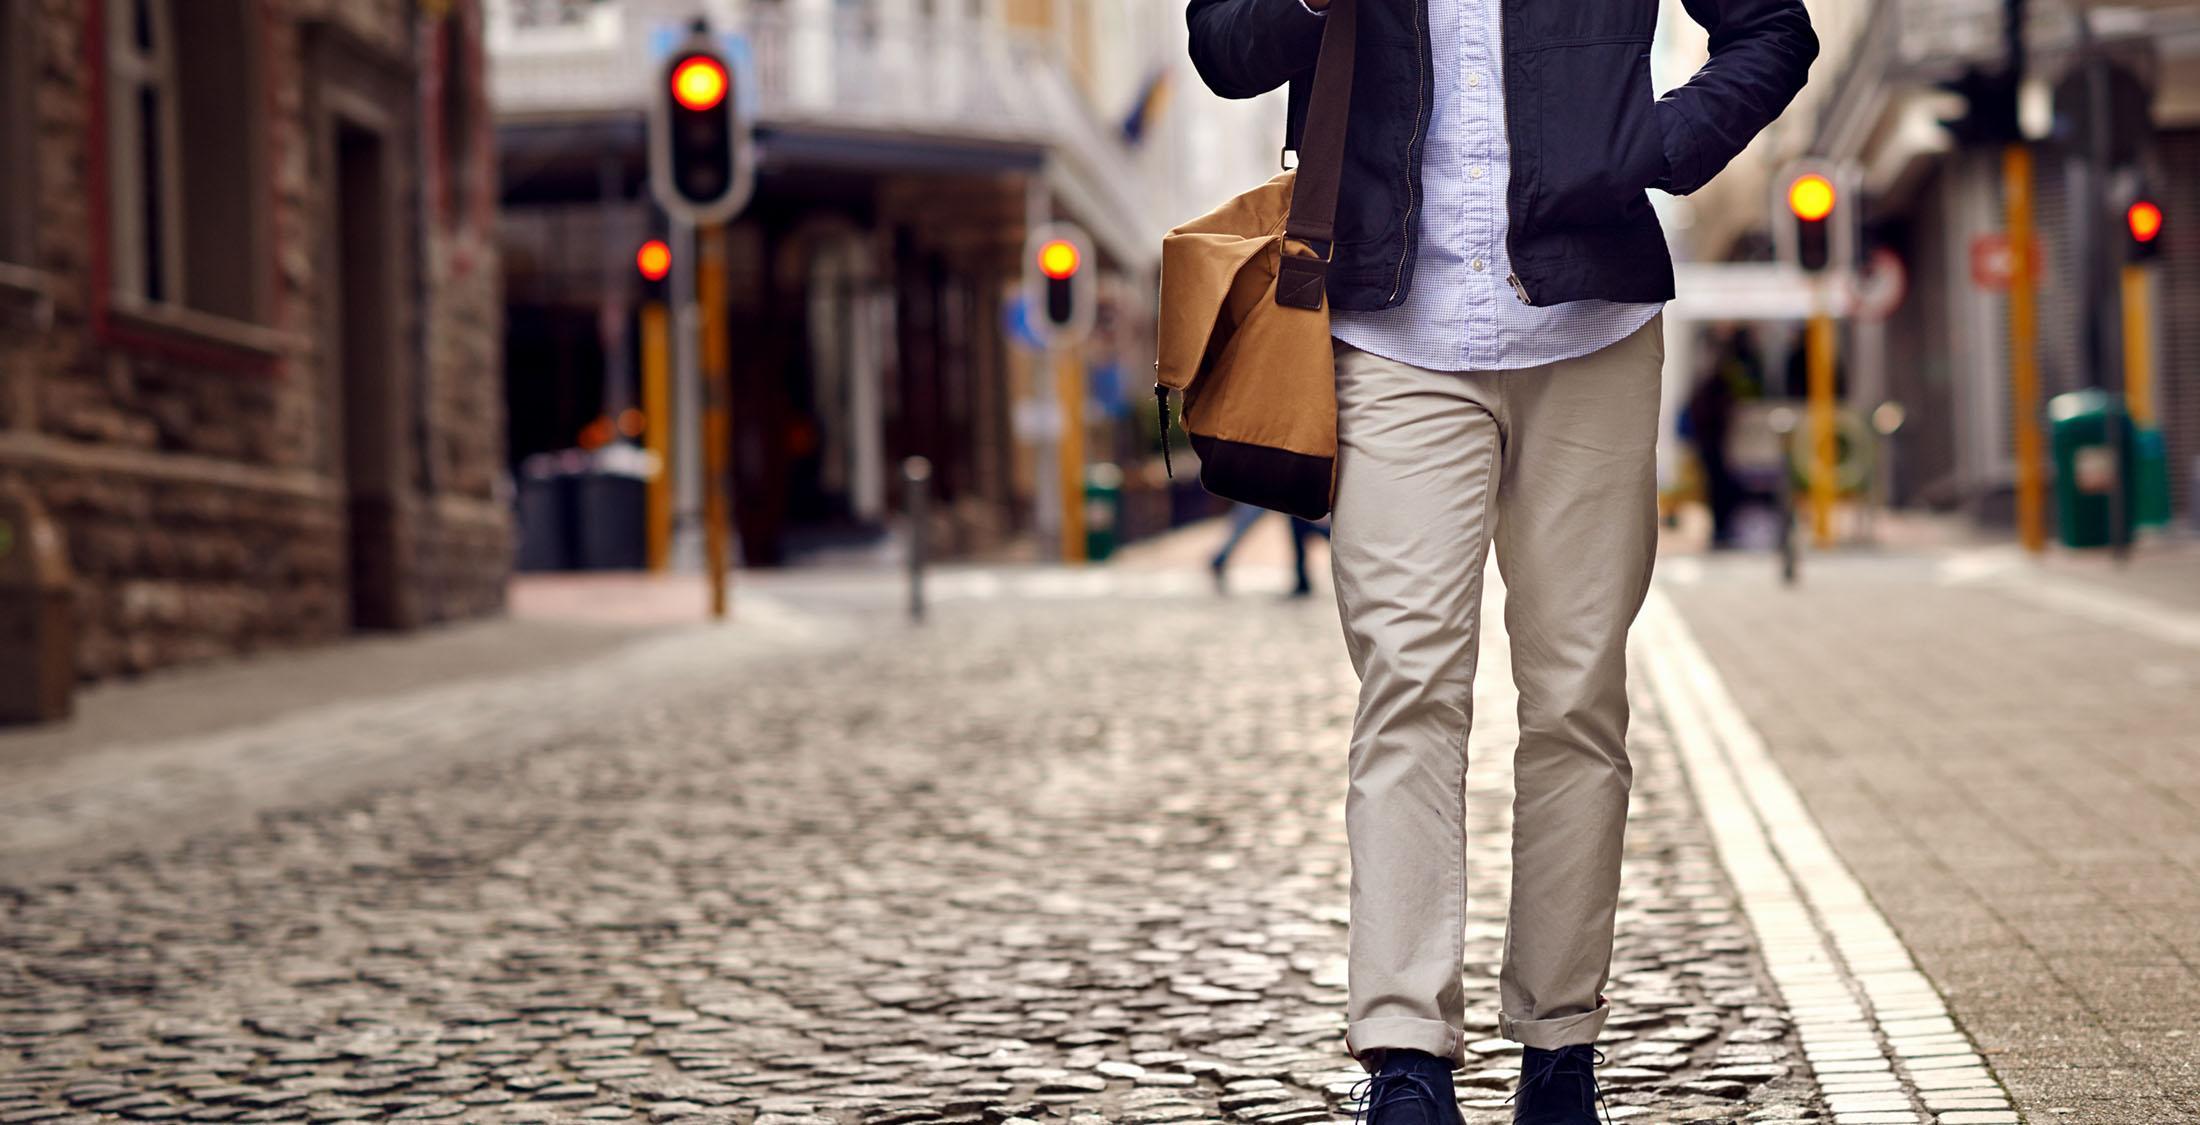 man walking down cobblestone street